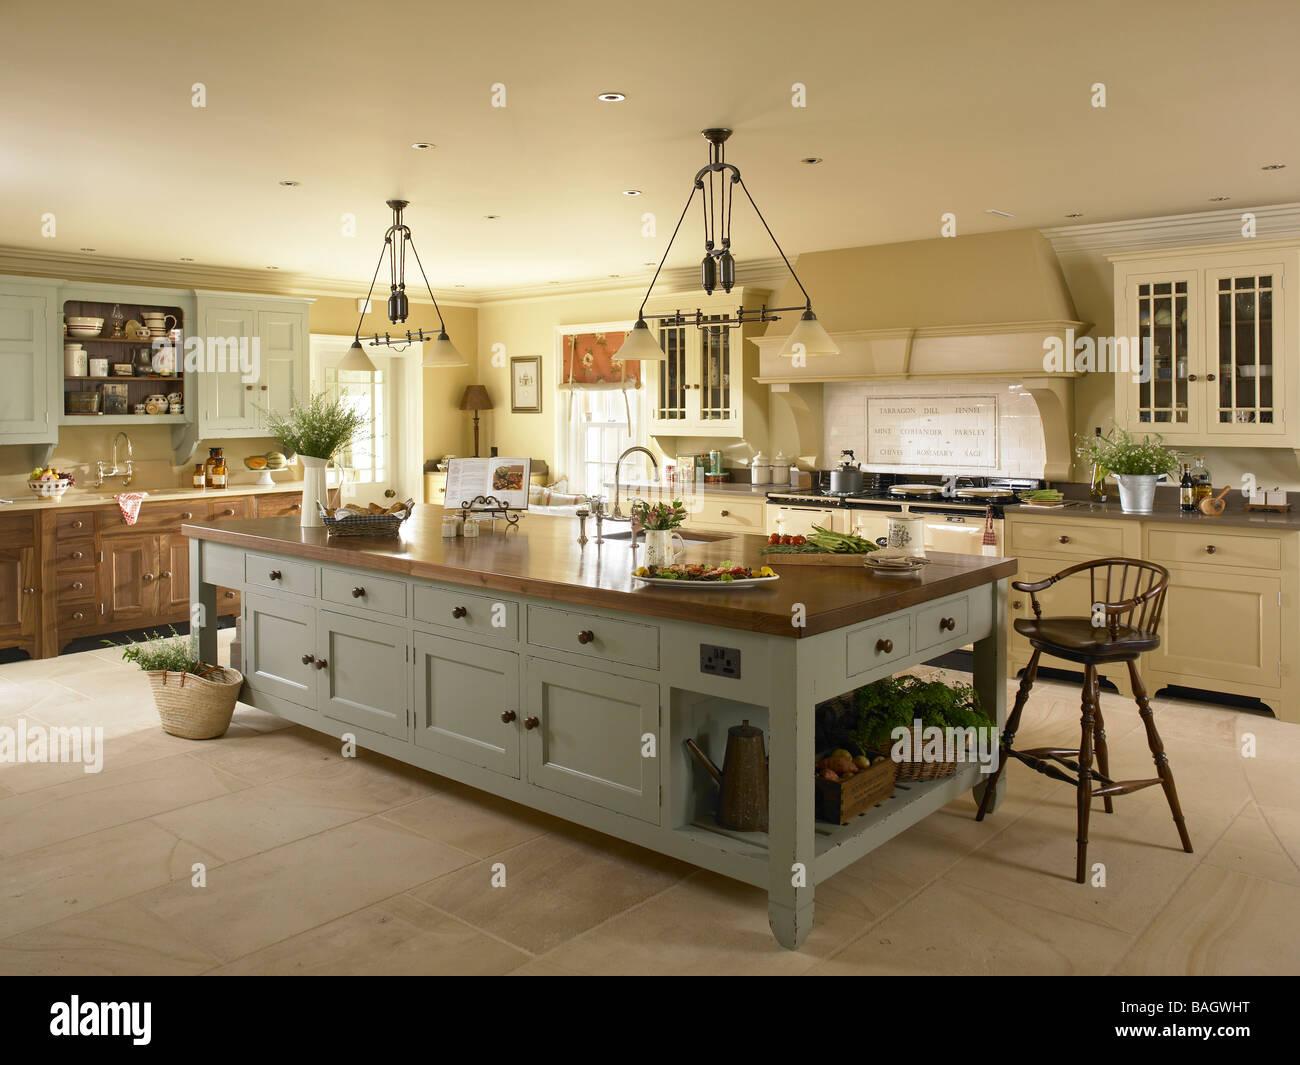 big kitchen island unique decor a large unit stock photo royalty free